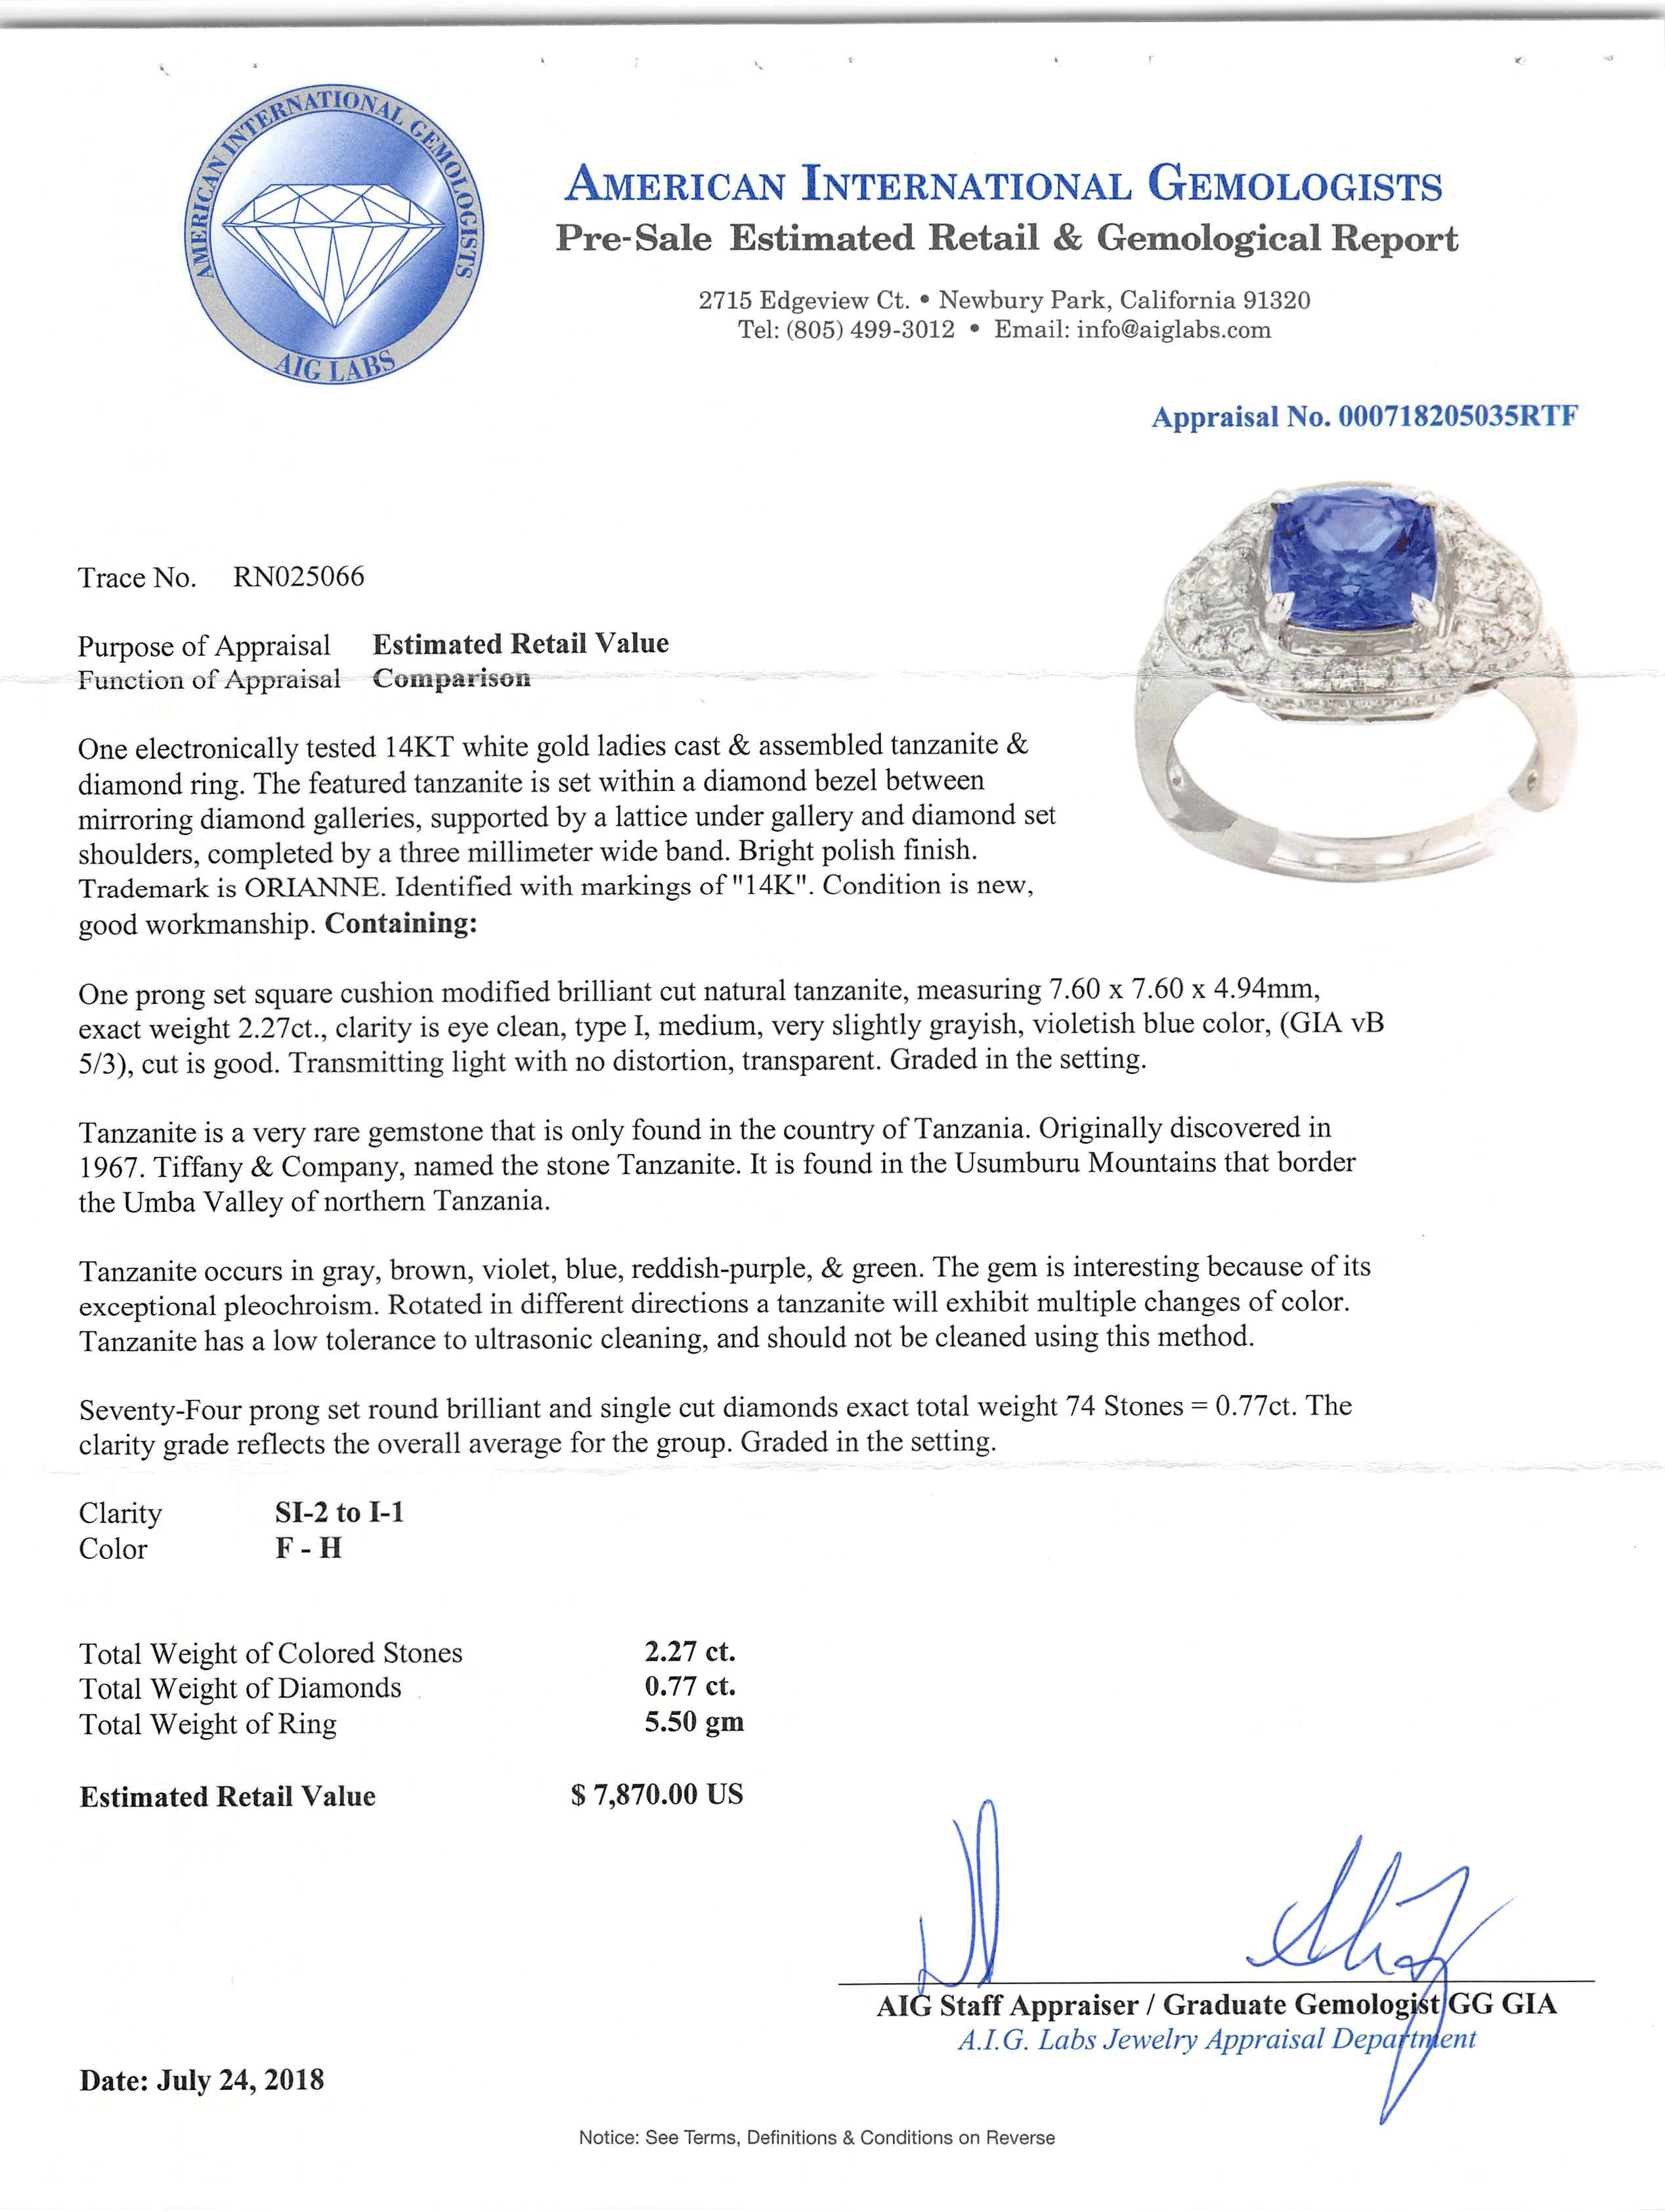 Lot 592 - 14 kt. White Gold, Tanzanite and Diamond Ring , prong set square cushion modified brilliant cut